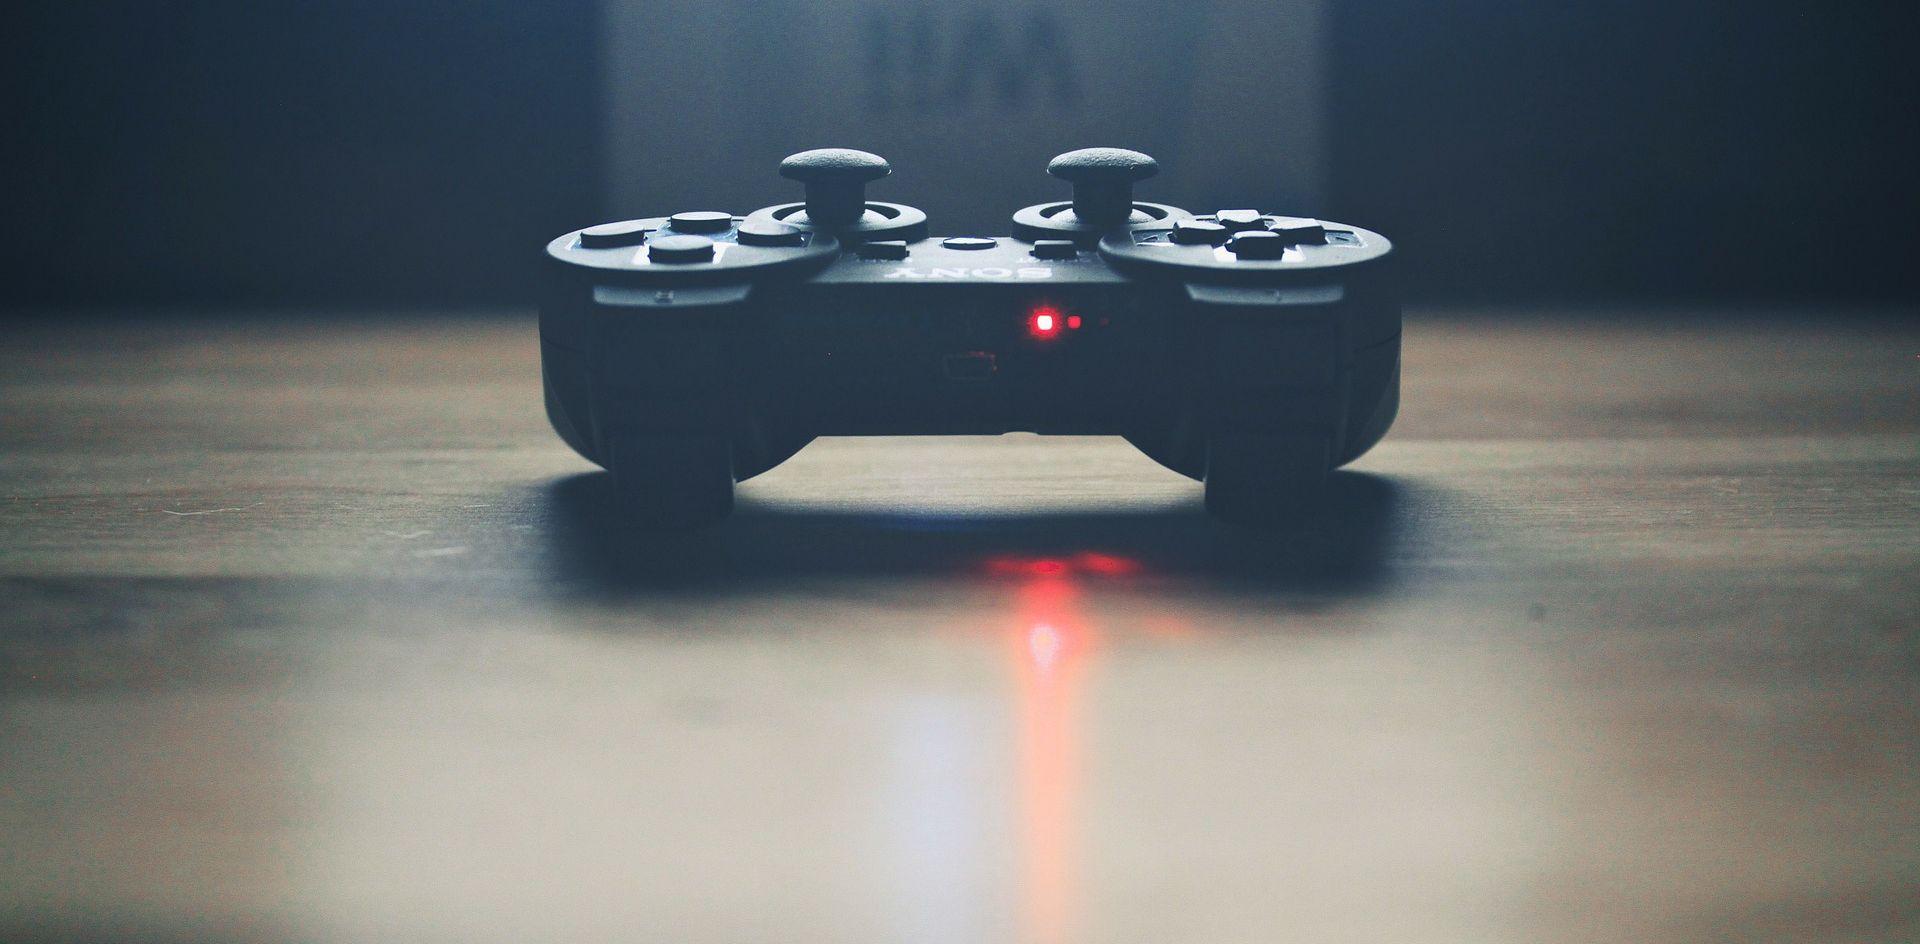 SONY SE HVALI Playstation 4 oborio rekord svojih prethodnika u brzini prodaje